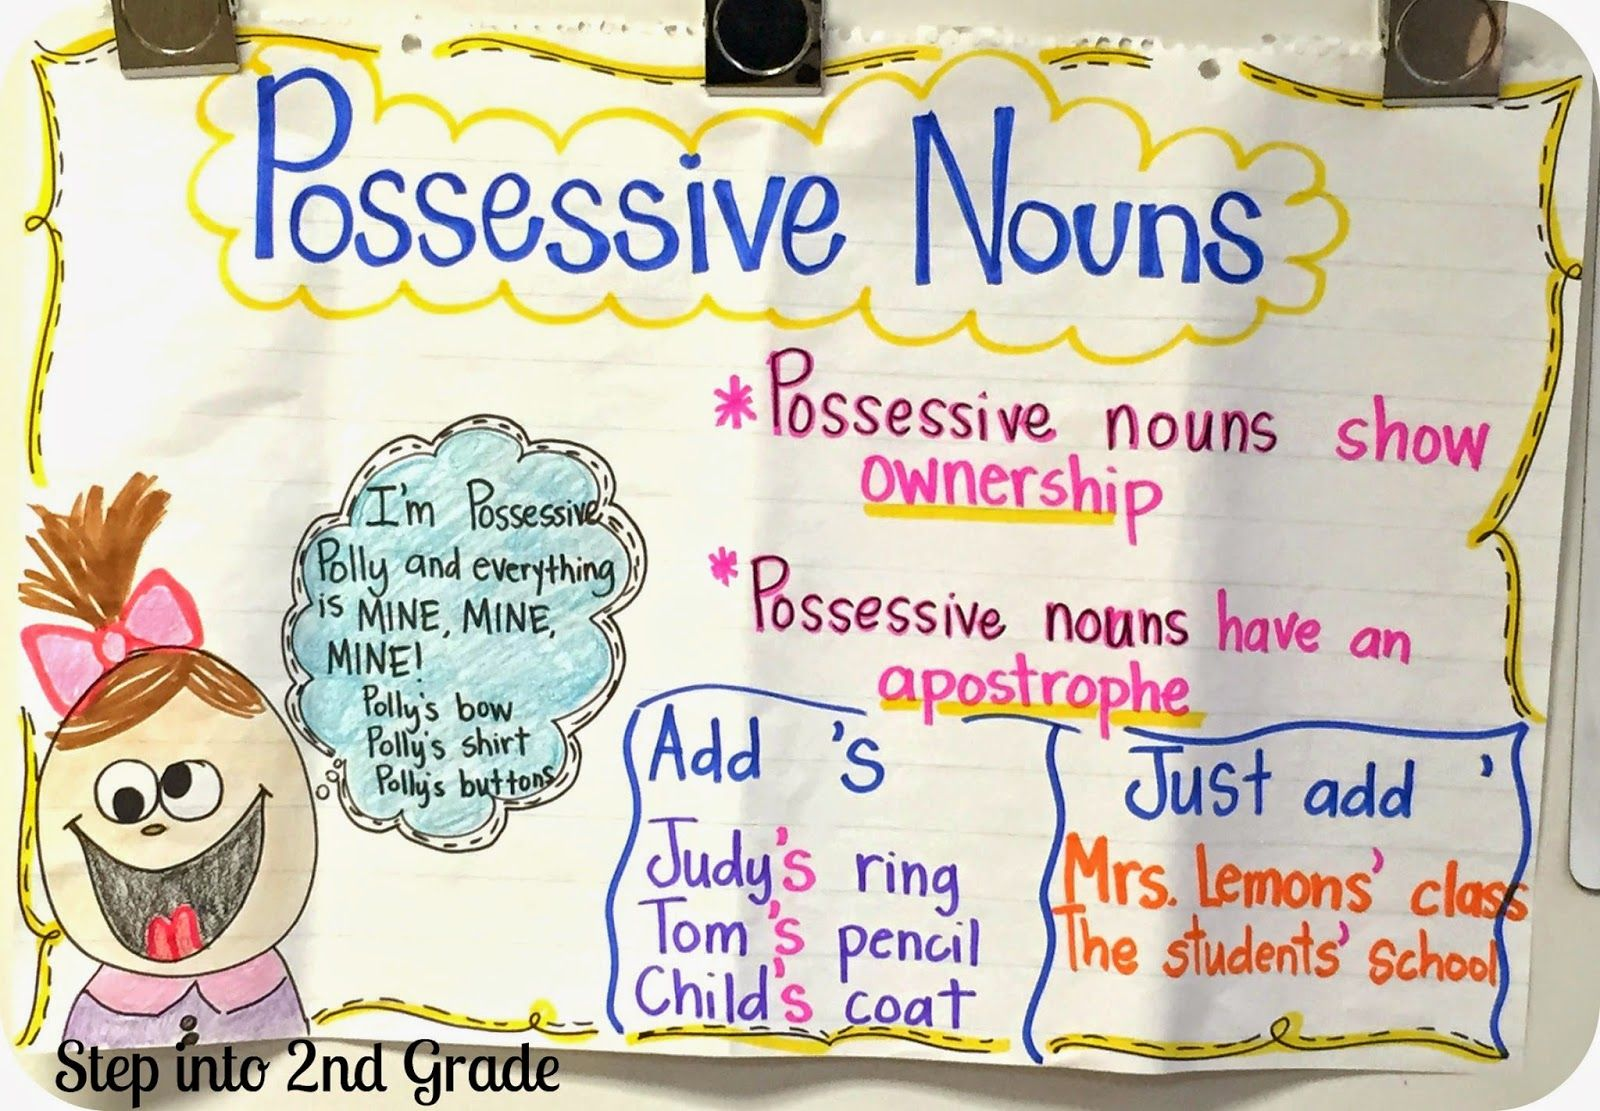 hight resolution of Possessive Nouns (Step into 2nd Grade with Mrs. Lemons)   Possessive nouns